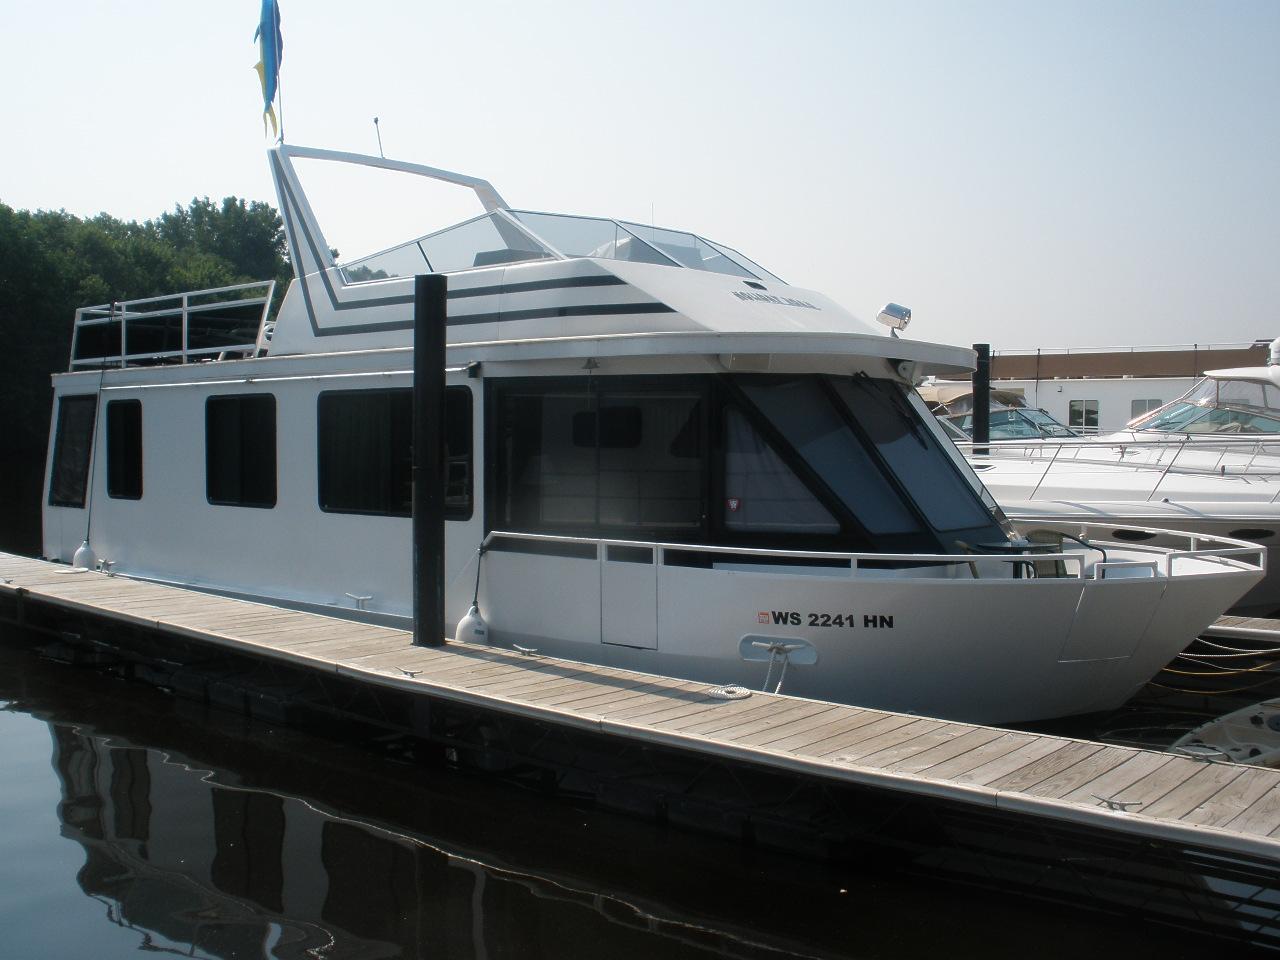 47 ft 1994 skipperliner houseboat